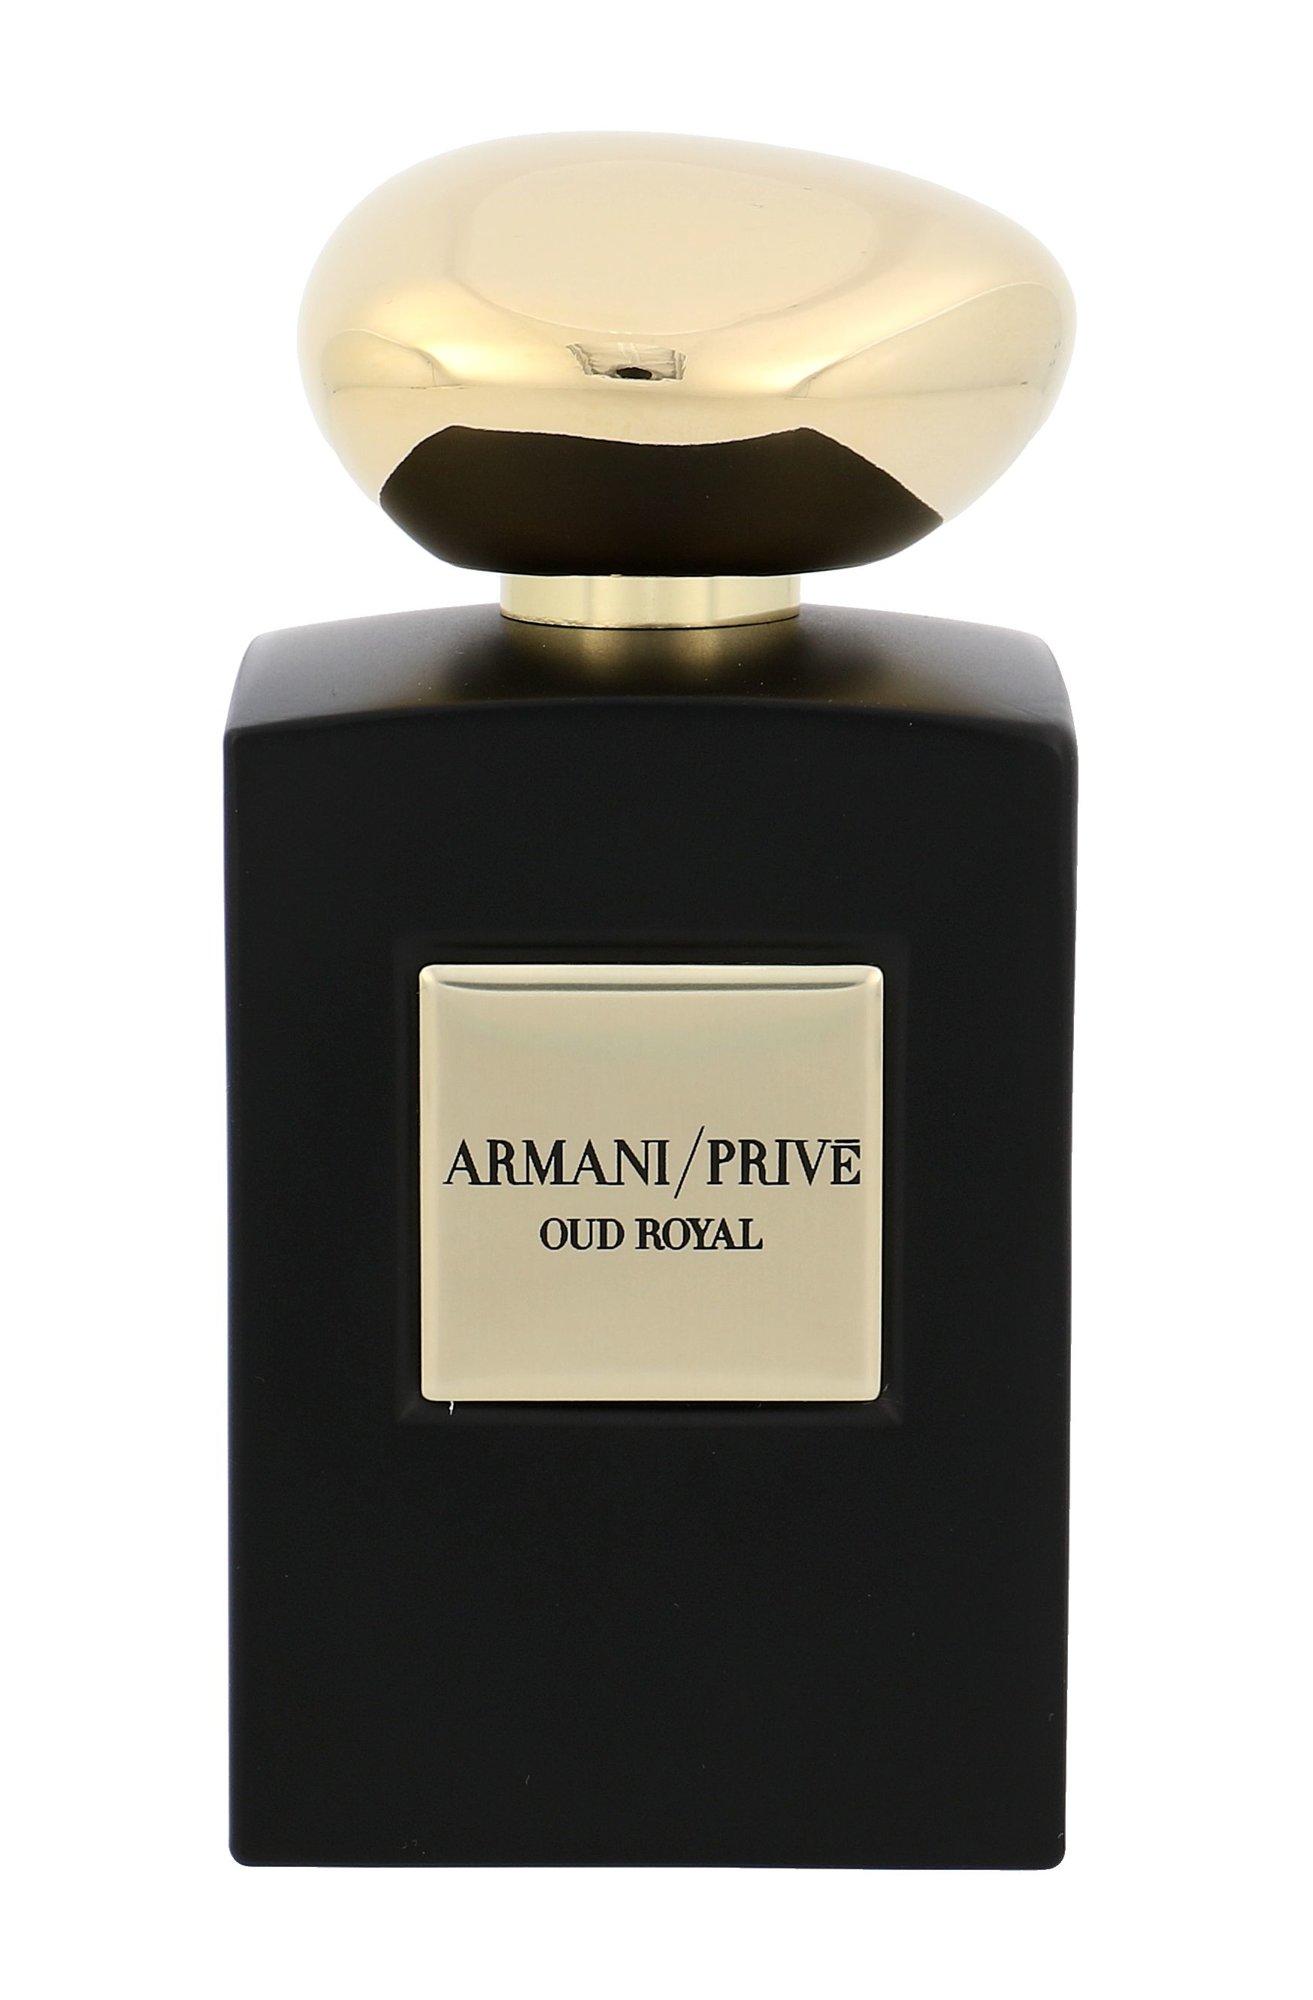 Armani Privé Oud Royal EDP 100ml